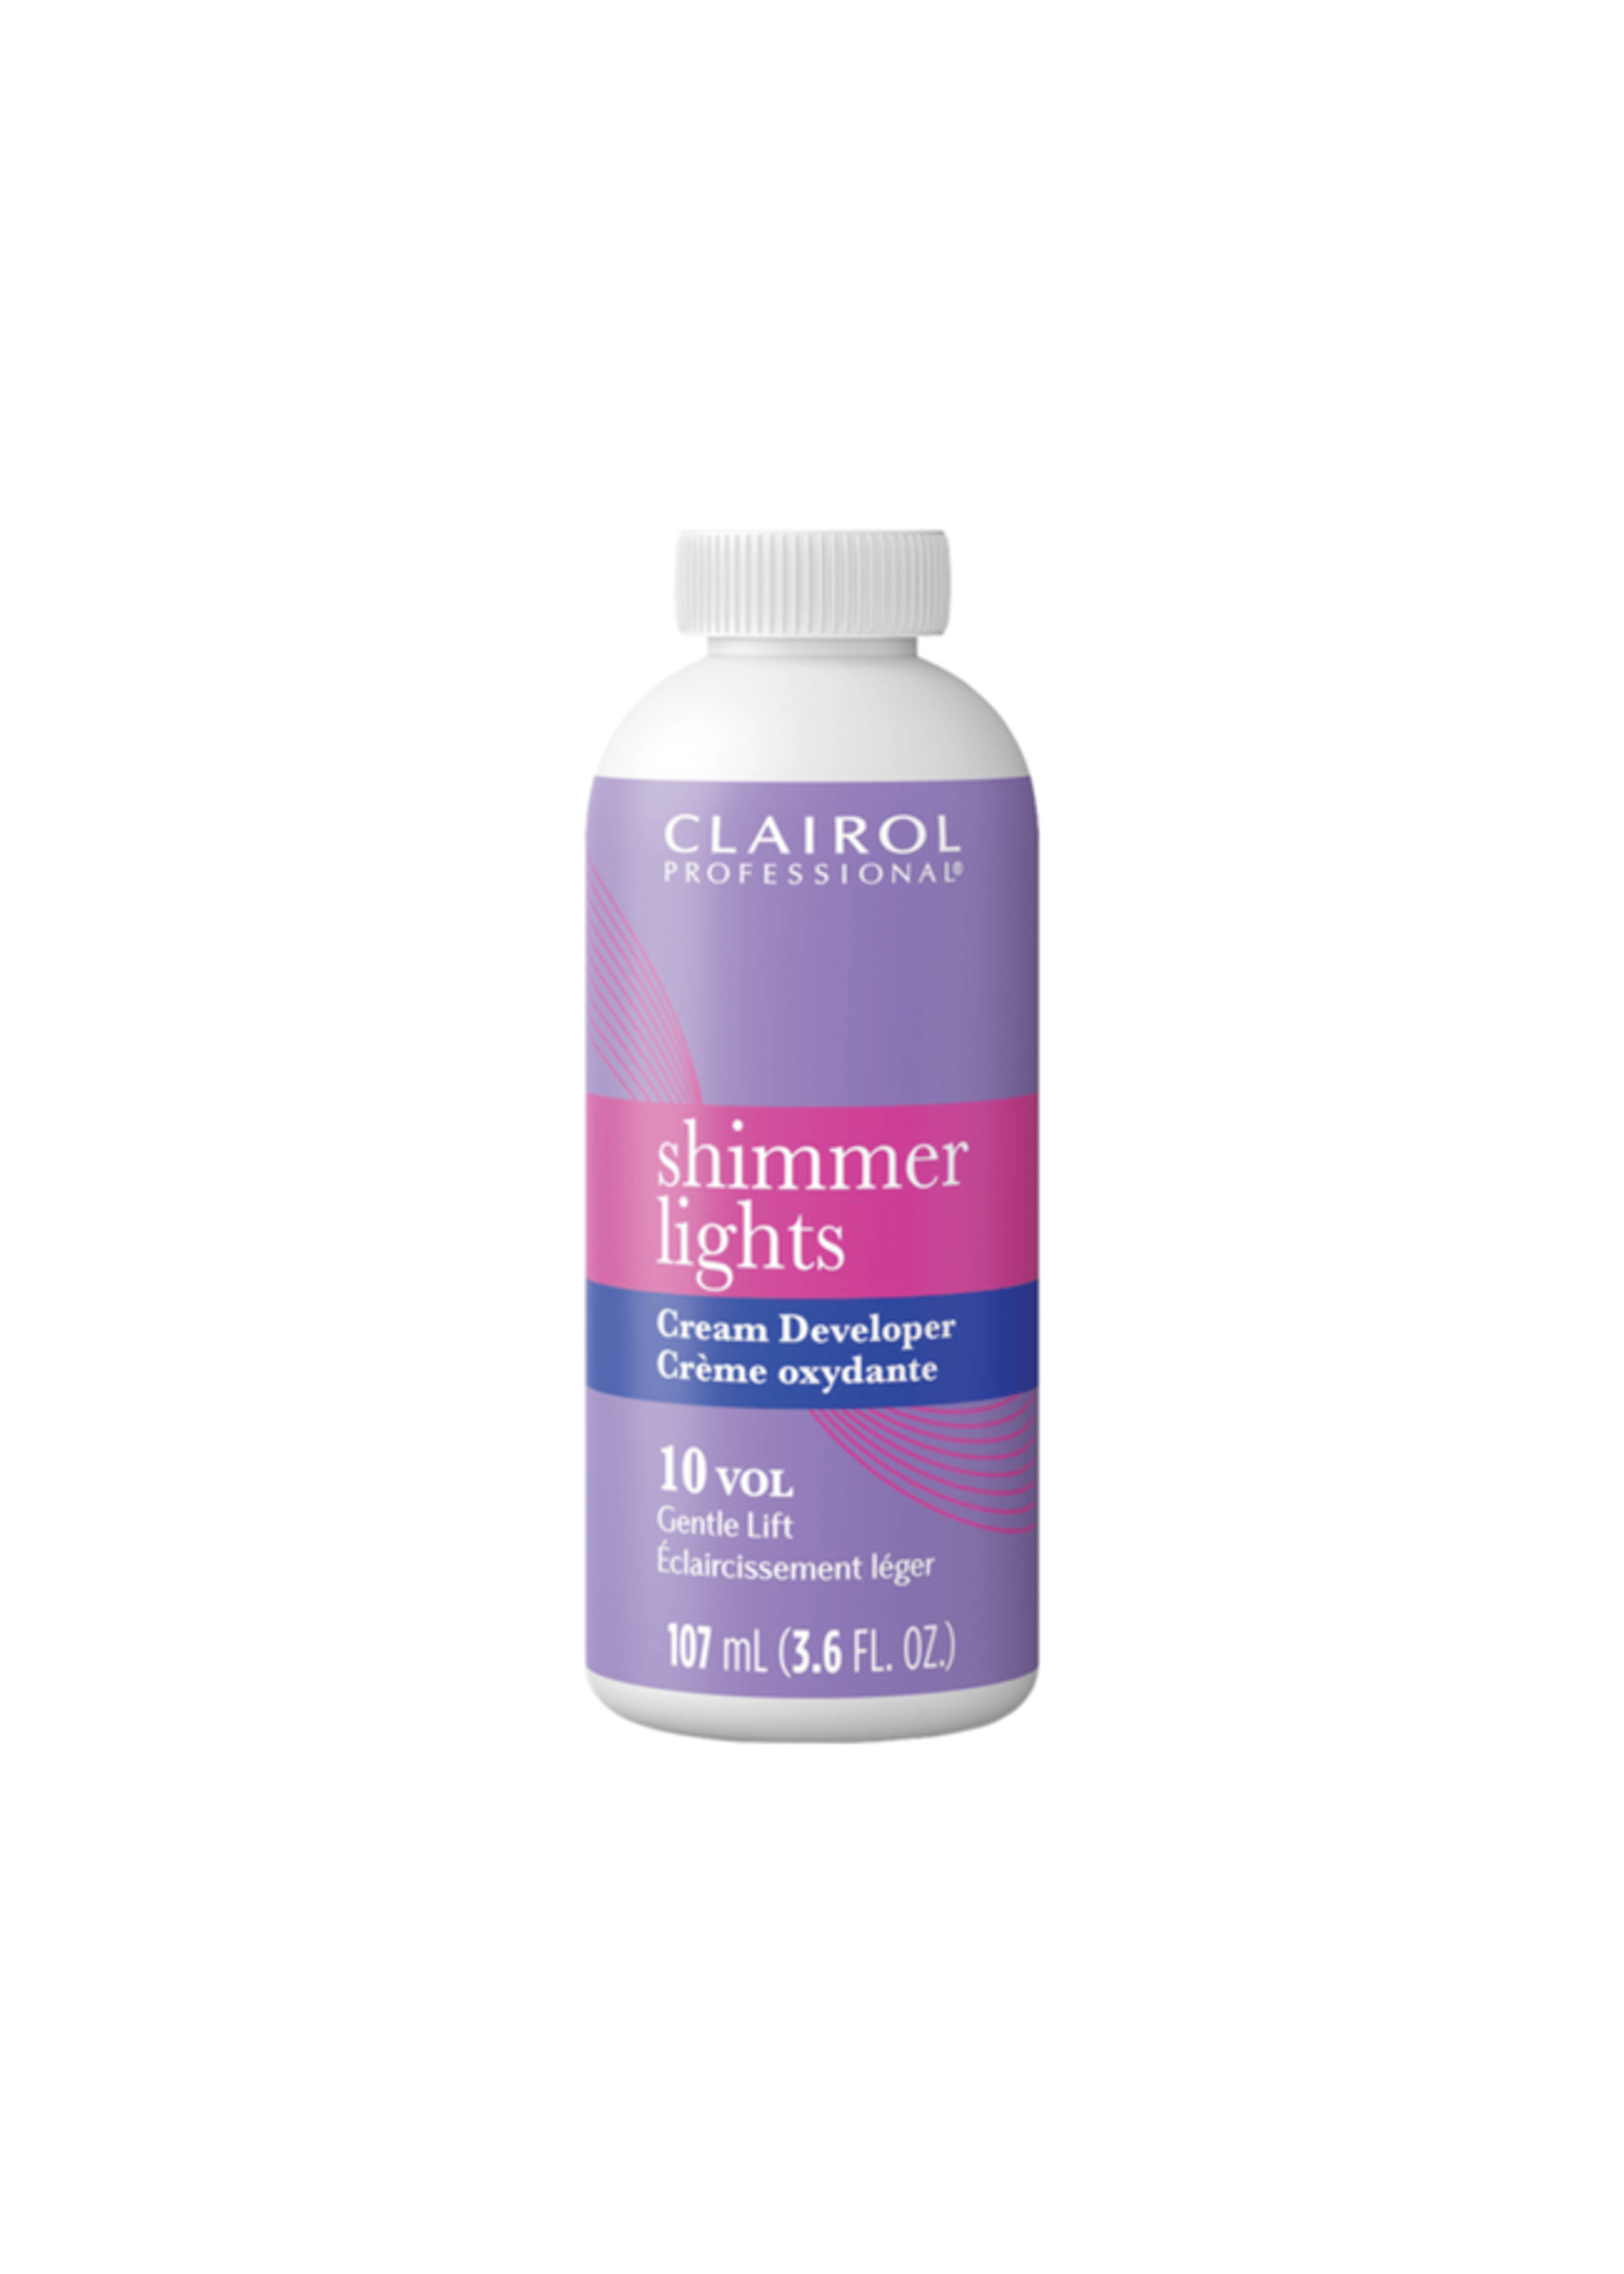 Clairol Professional Shimmer Lights 10 V Cream Developer